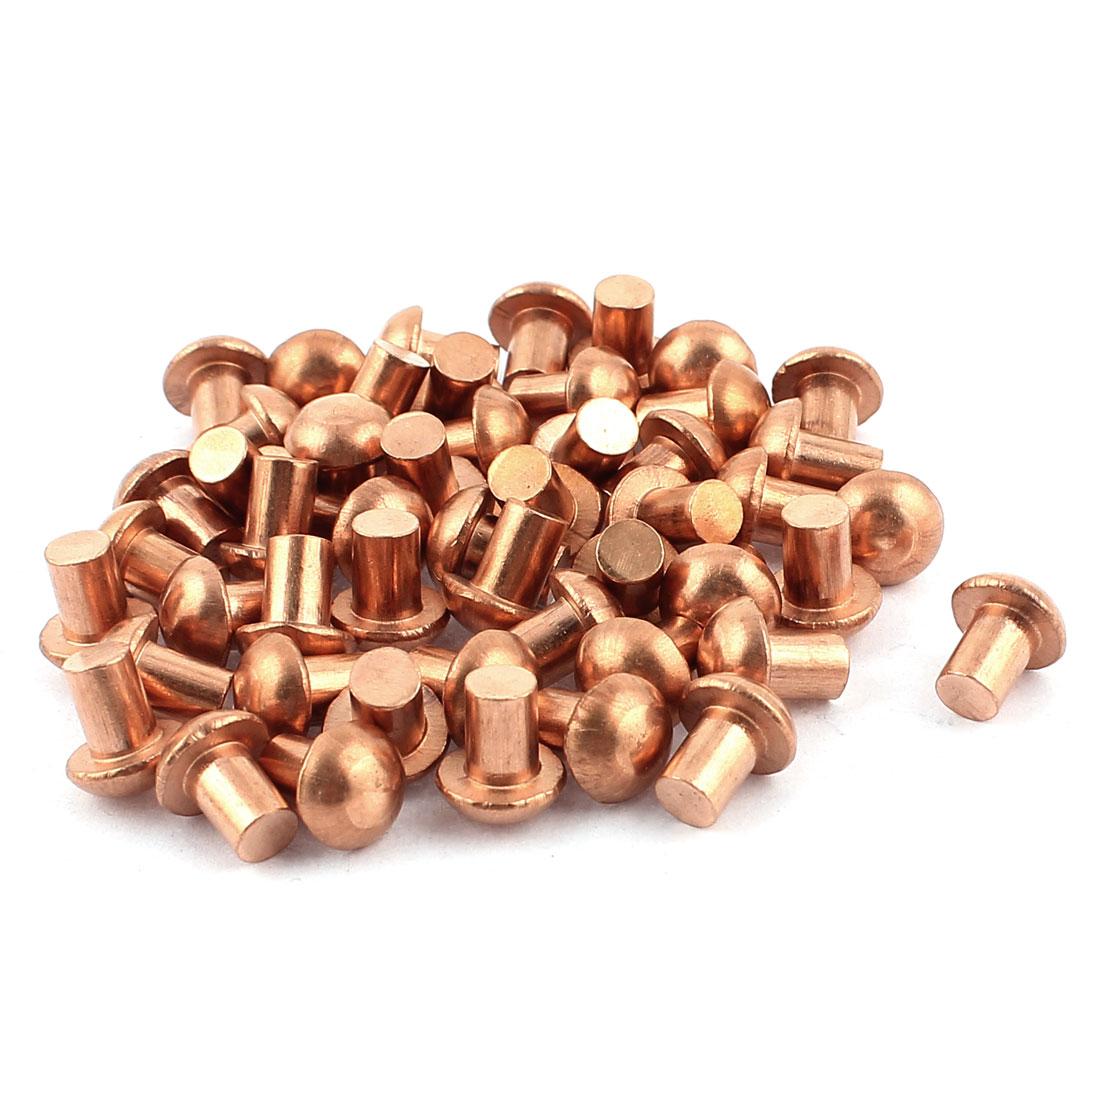 "50 Pcs 1/4"" Diameter 5/16"" L Shank Copper Round Head Solid Rivets Fasteners"